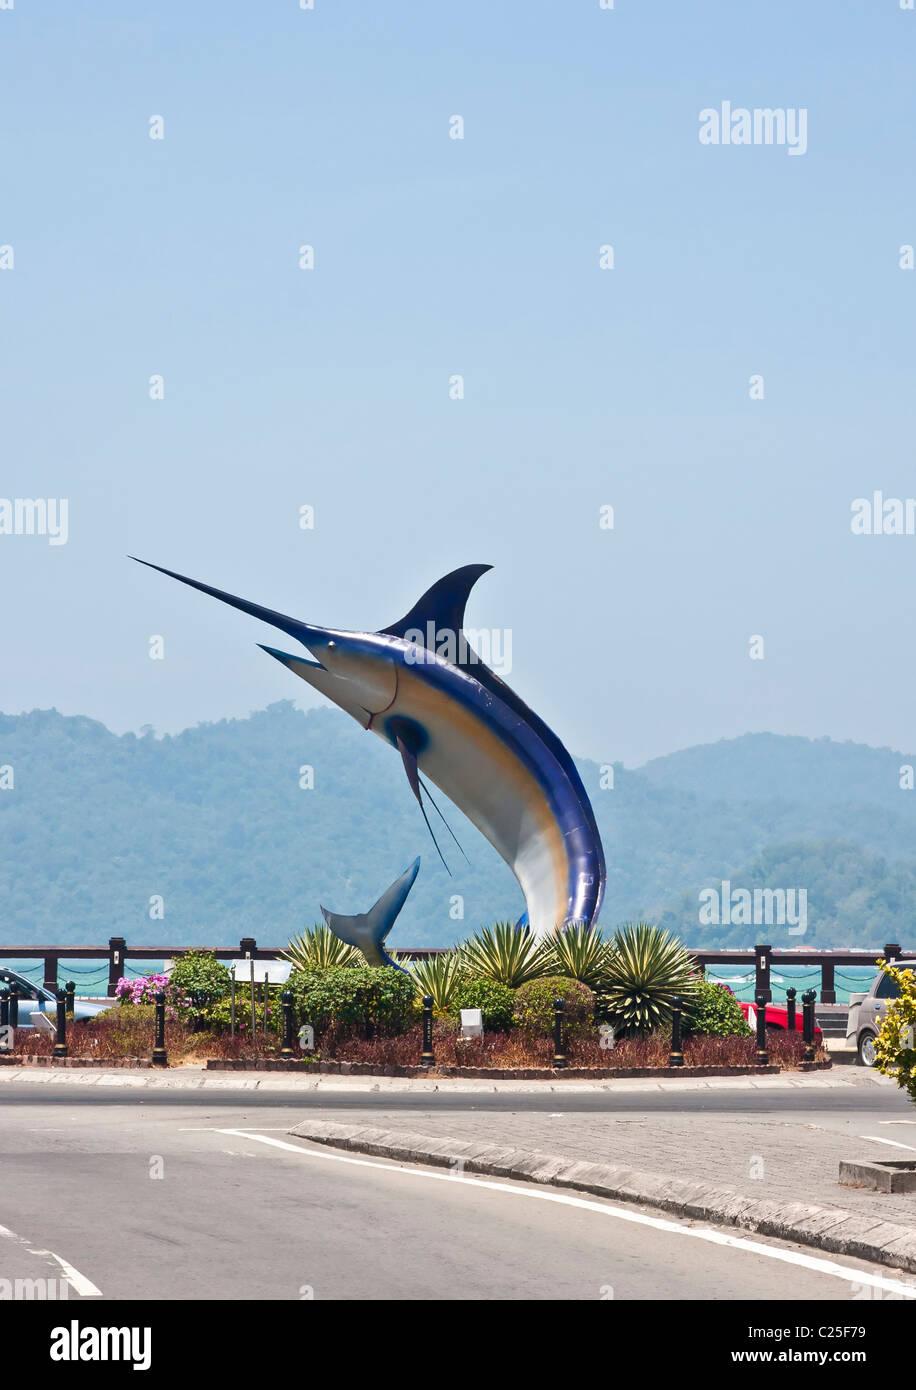 Marlin Statue in Kota Kinabalu, Sabah, Borneo, Malaysia - Stock Image